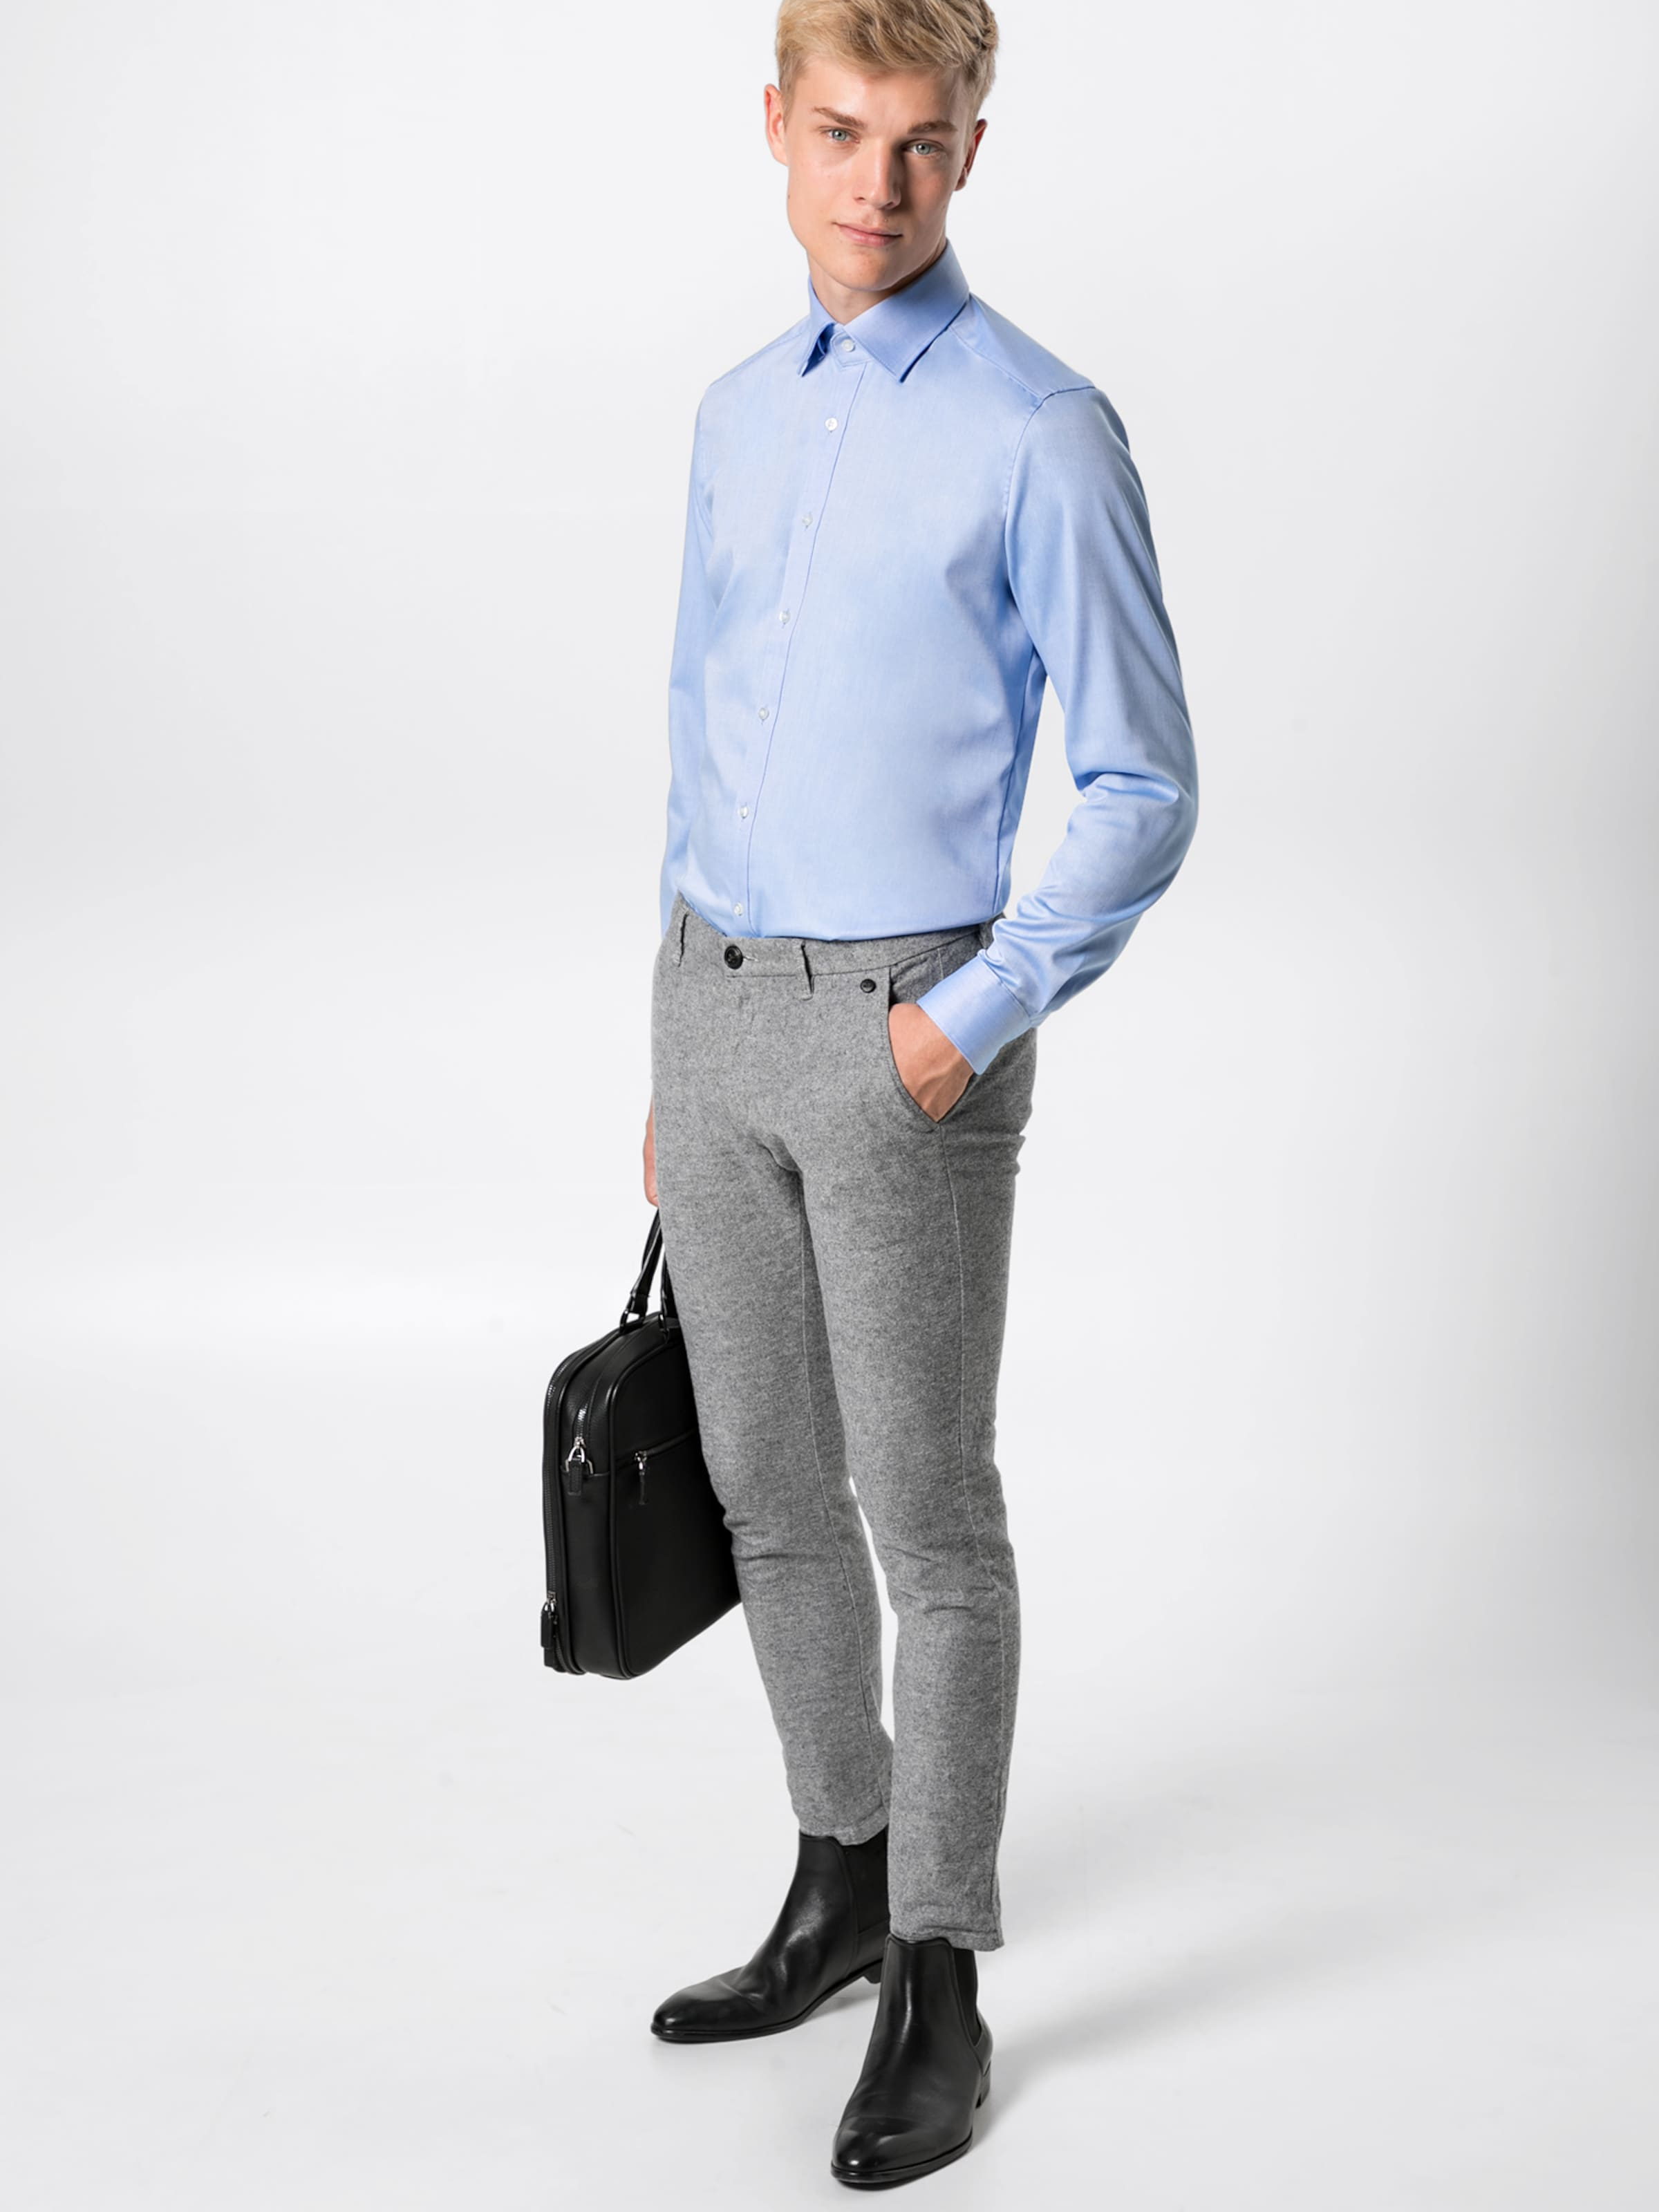 'level Twill' En Bleu Business 5 Olymp Uni Chemise rBsQhCotdx